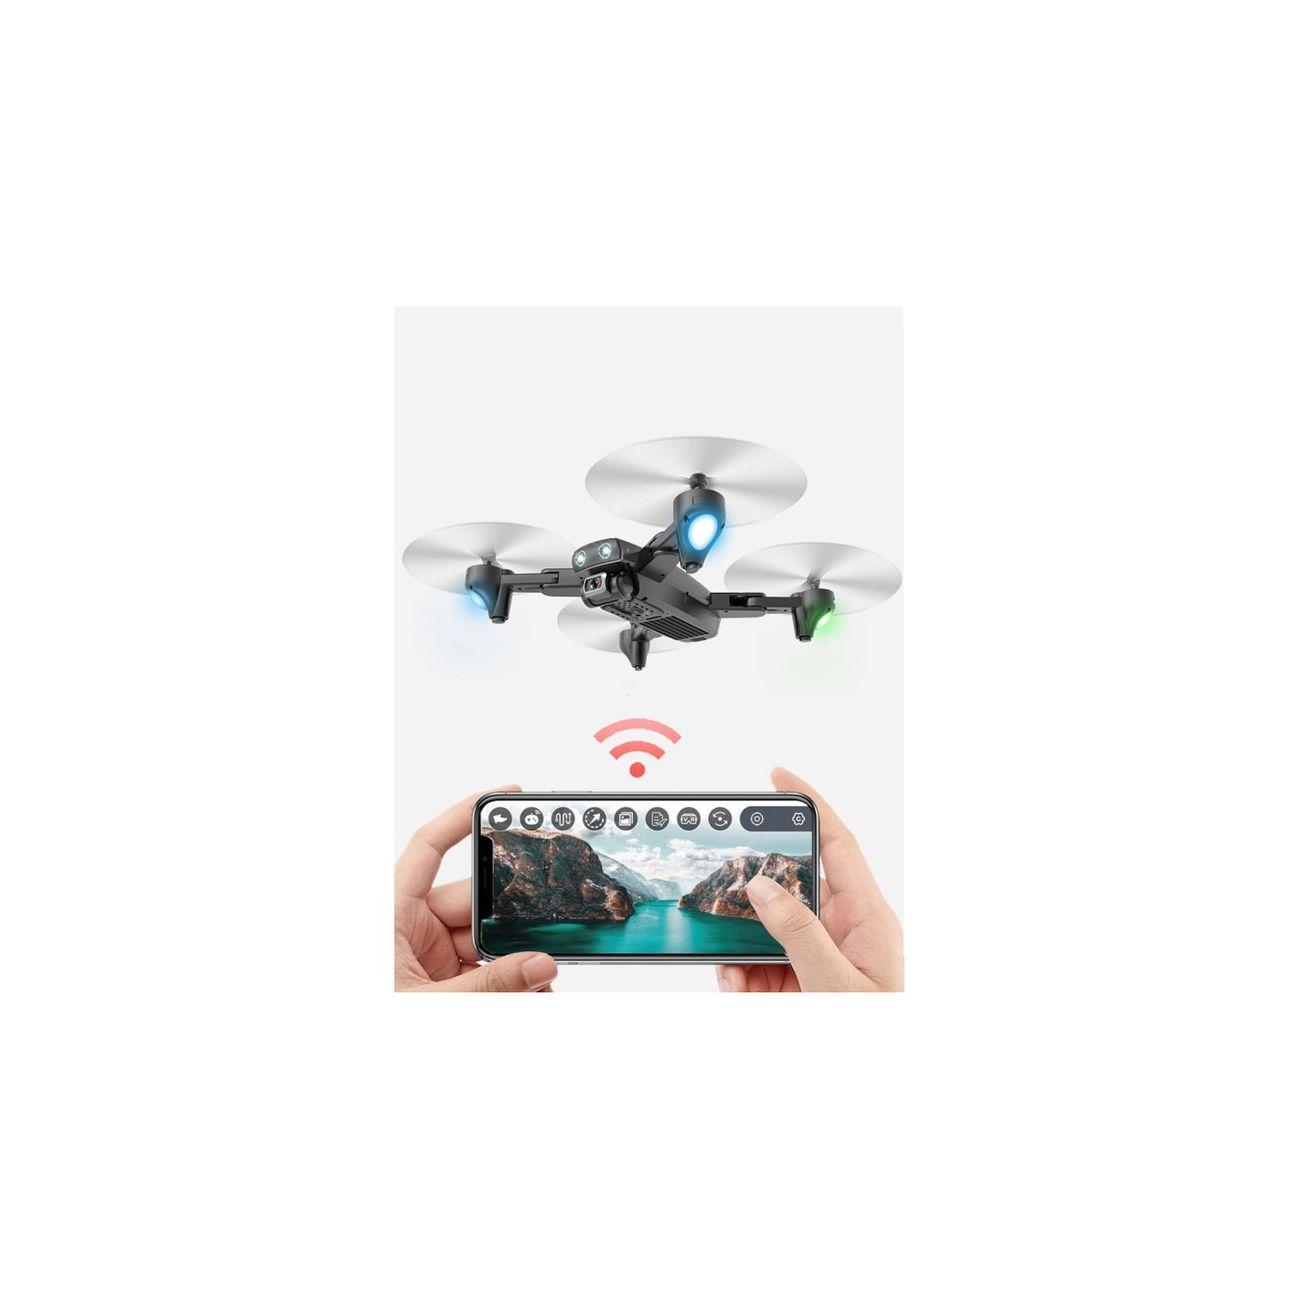 CELLYS Drone 5G 1080p WIFI pliable GPS